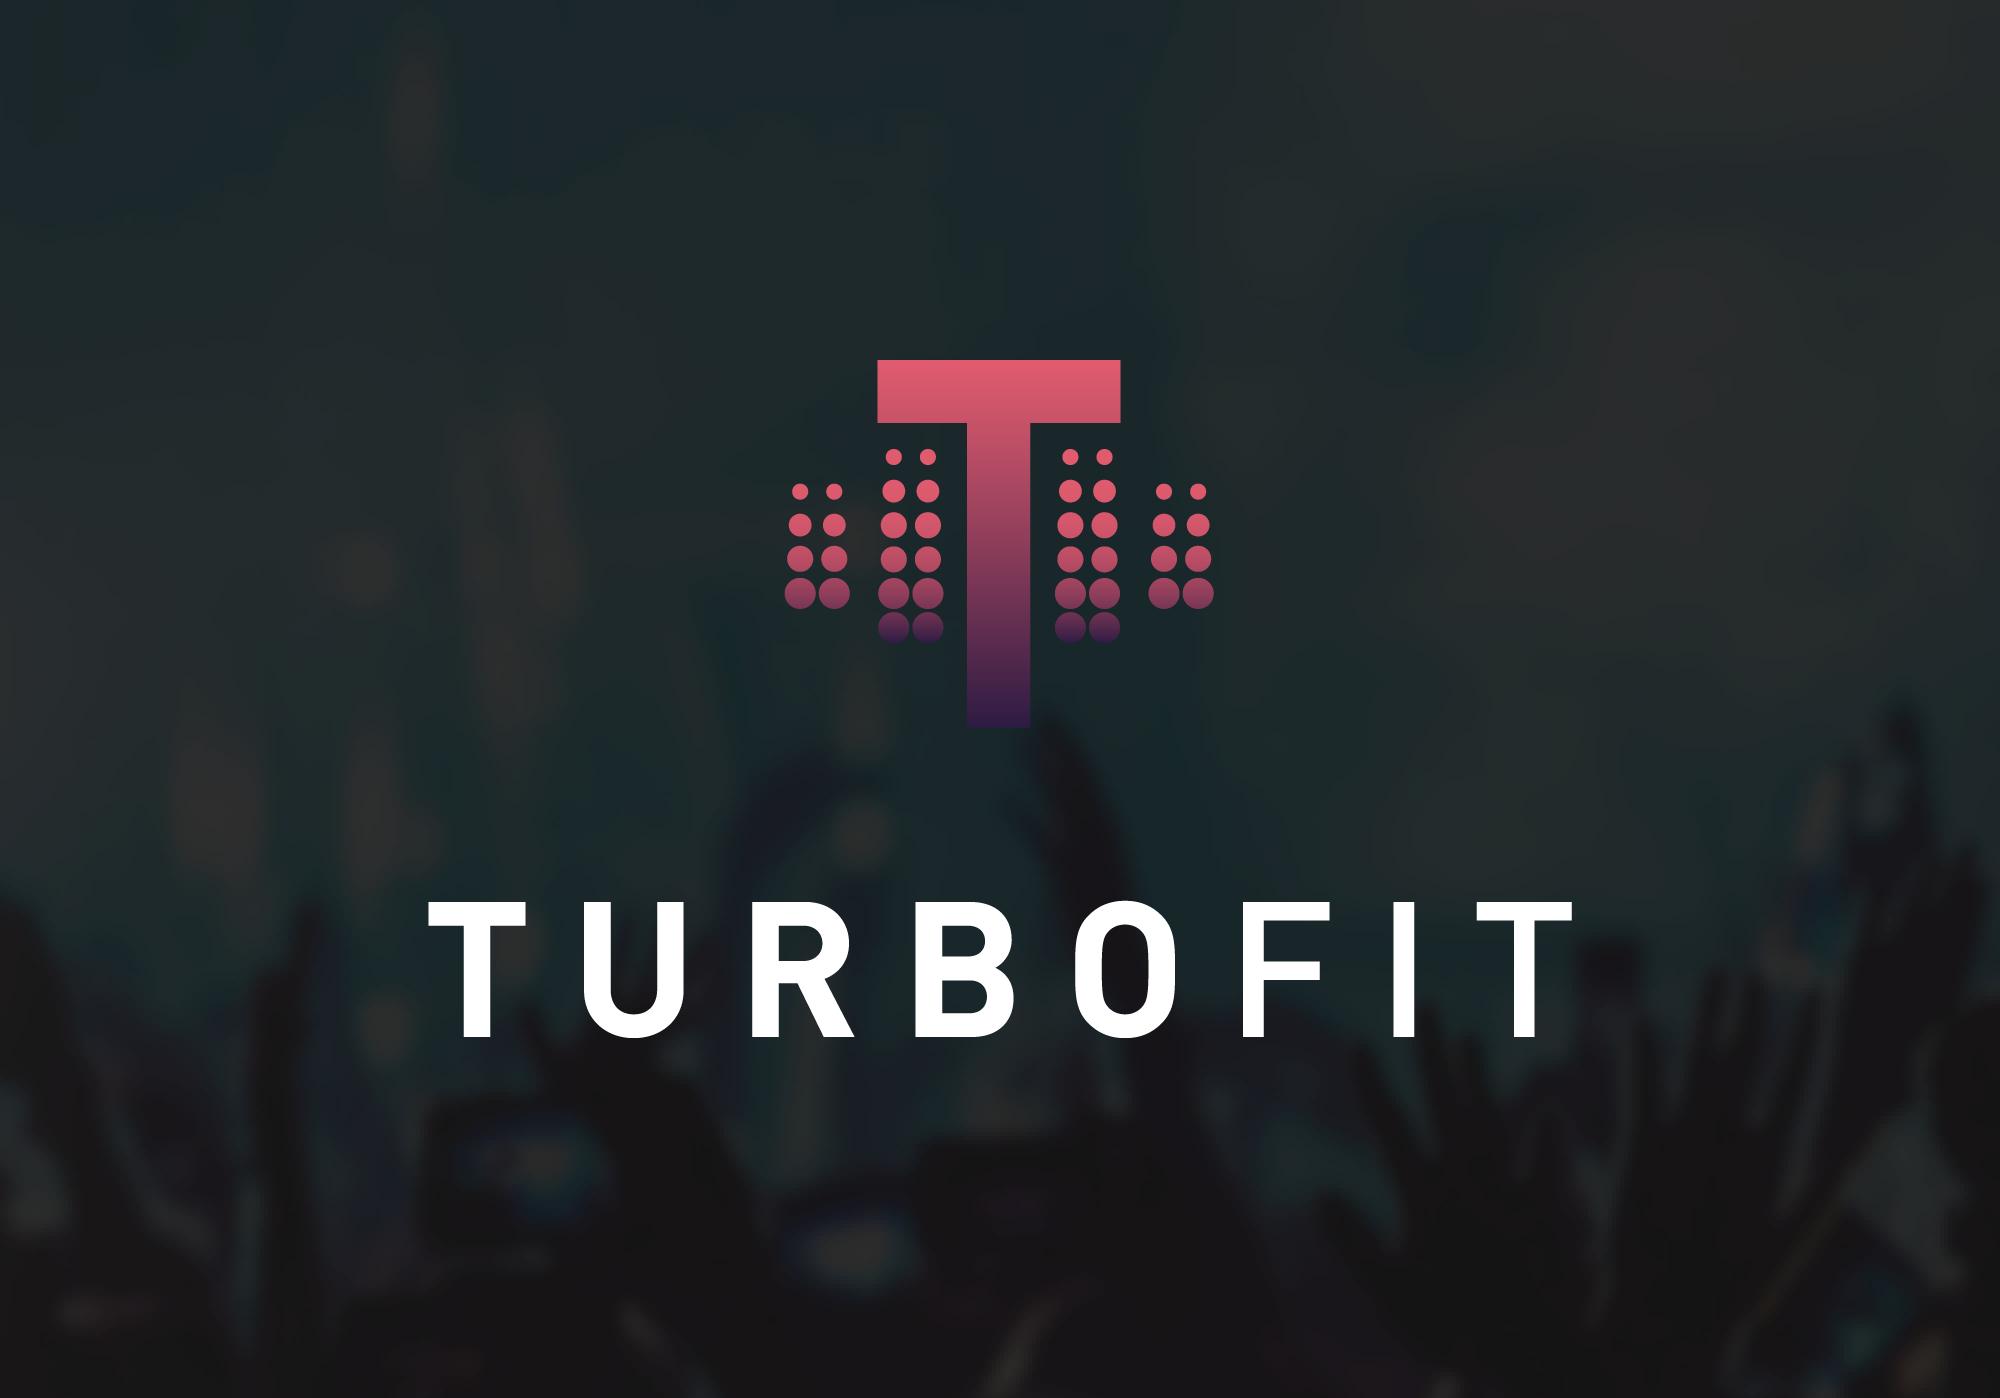 TurboFitArtboard 1@2x.png